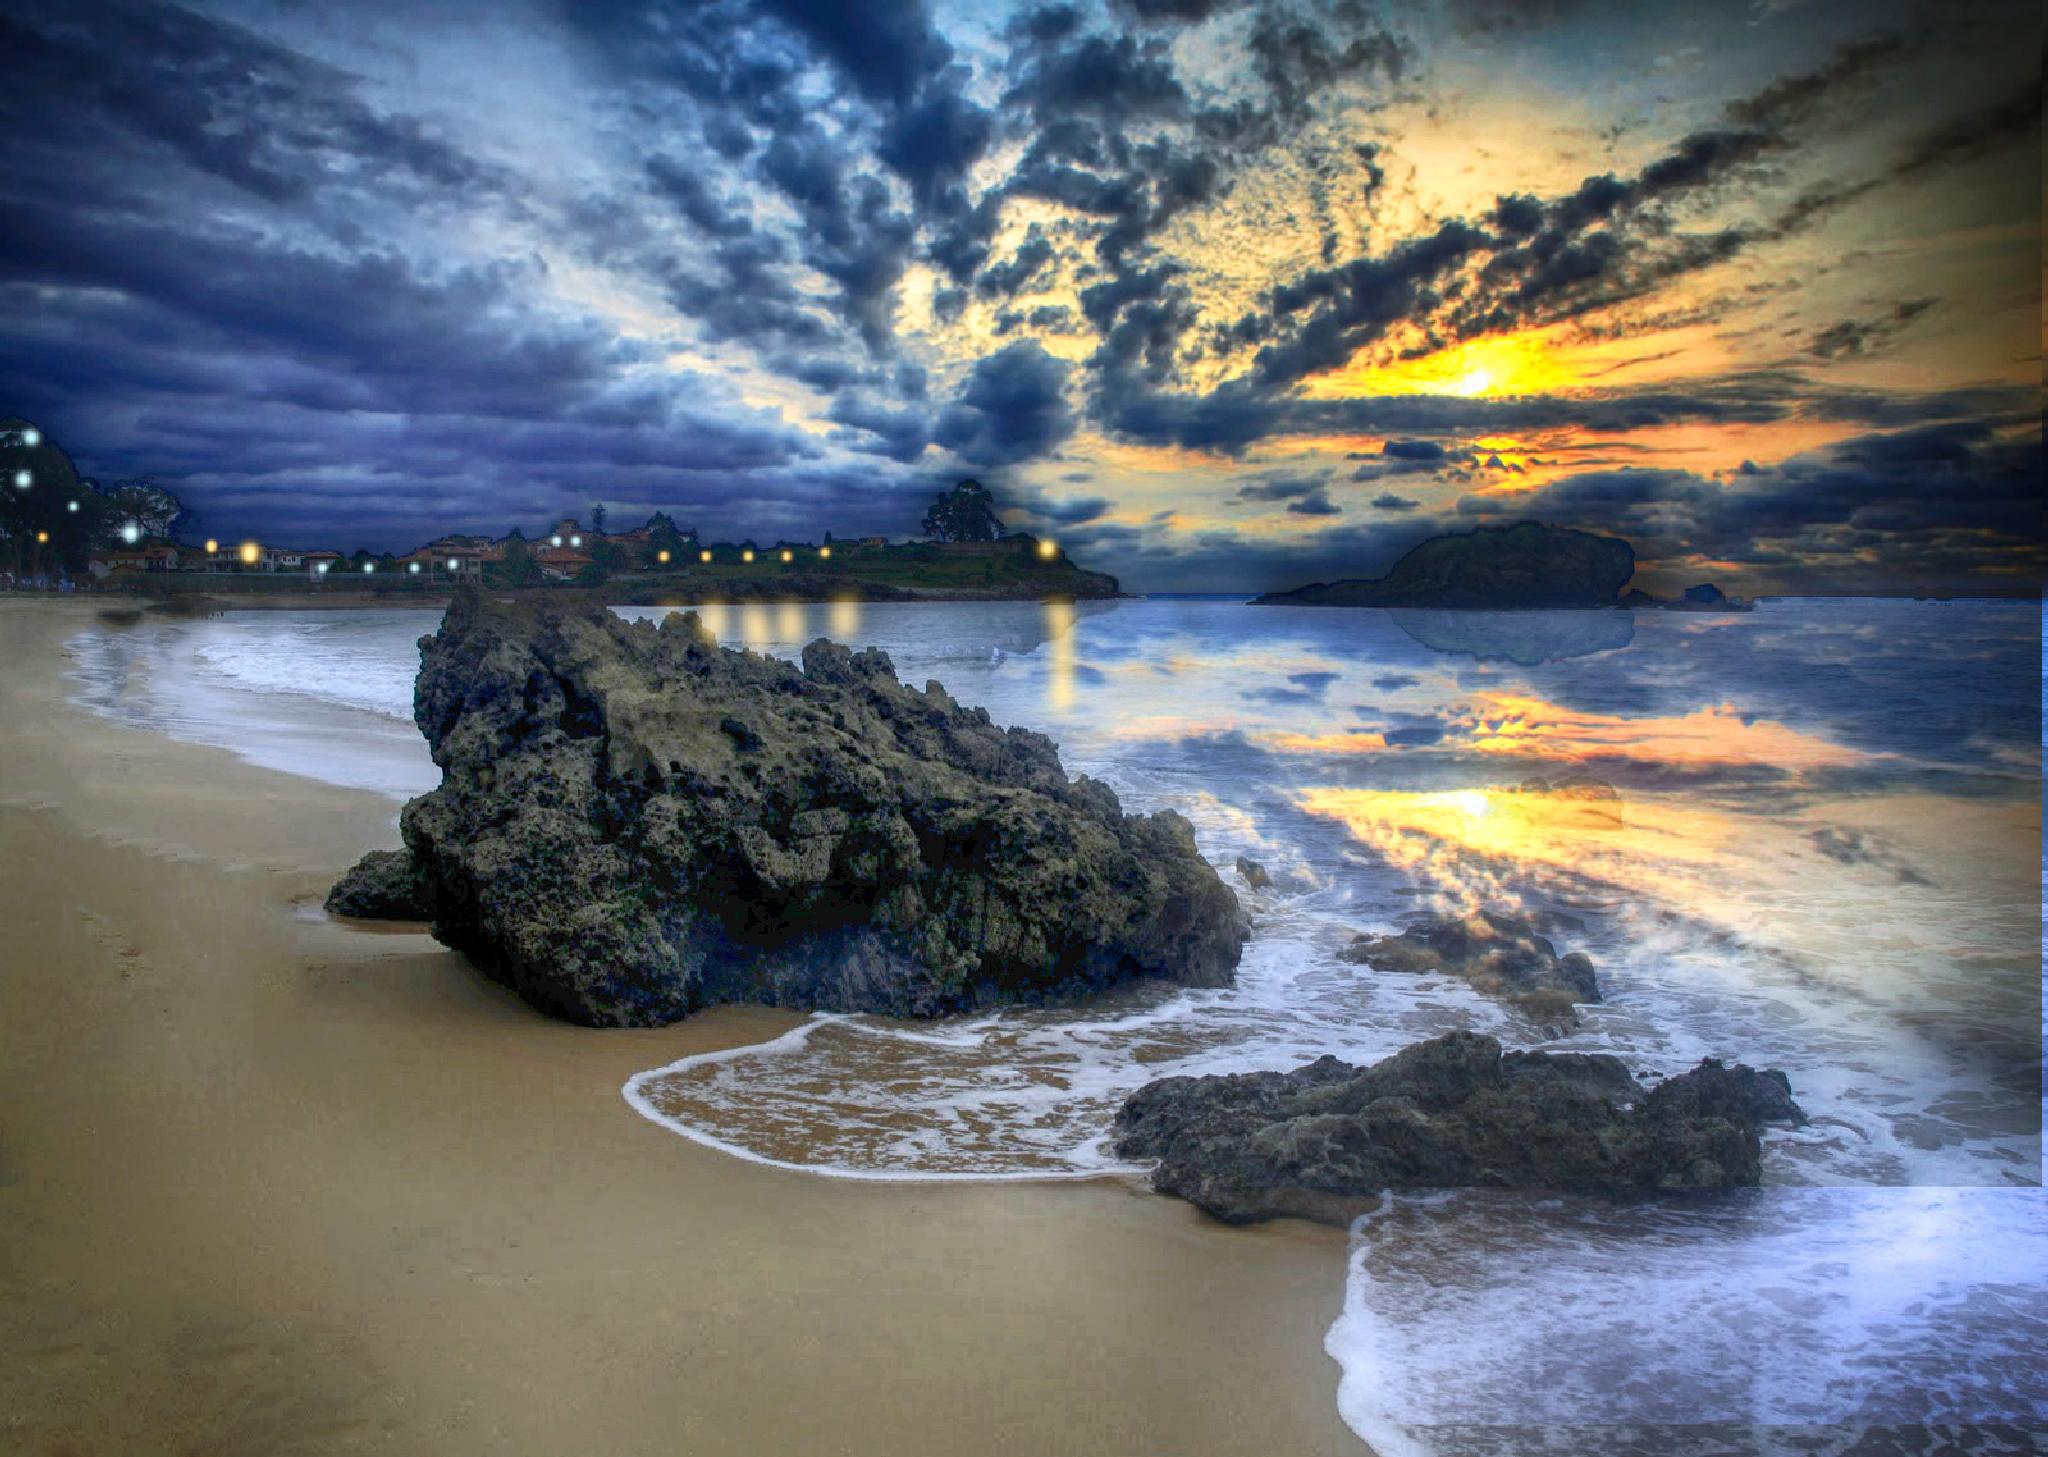 La Isla,Colunga by toalafoto